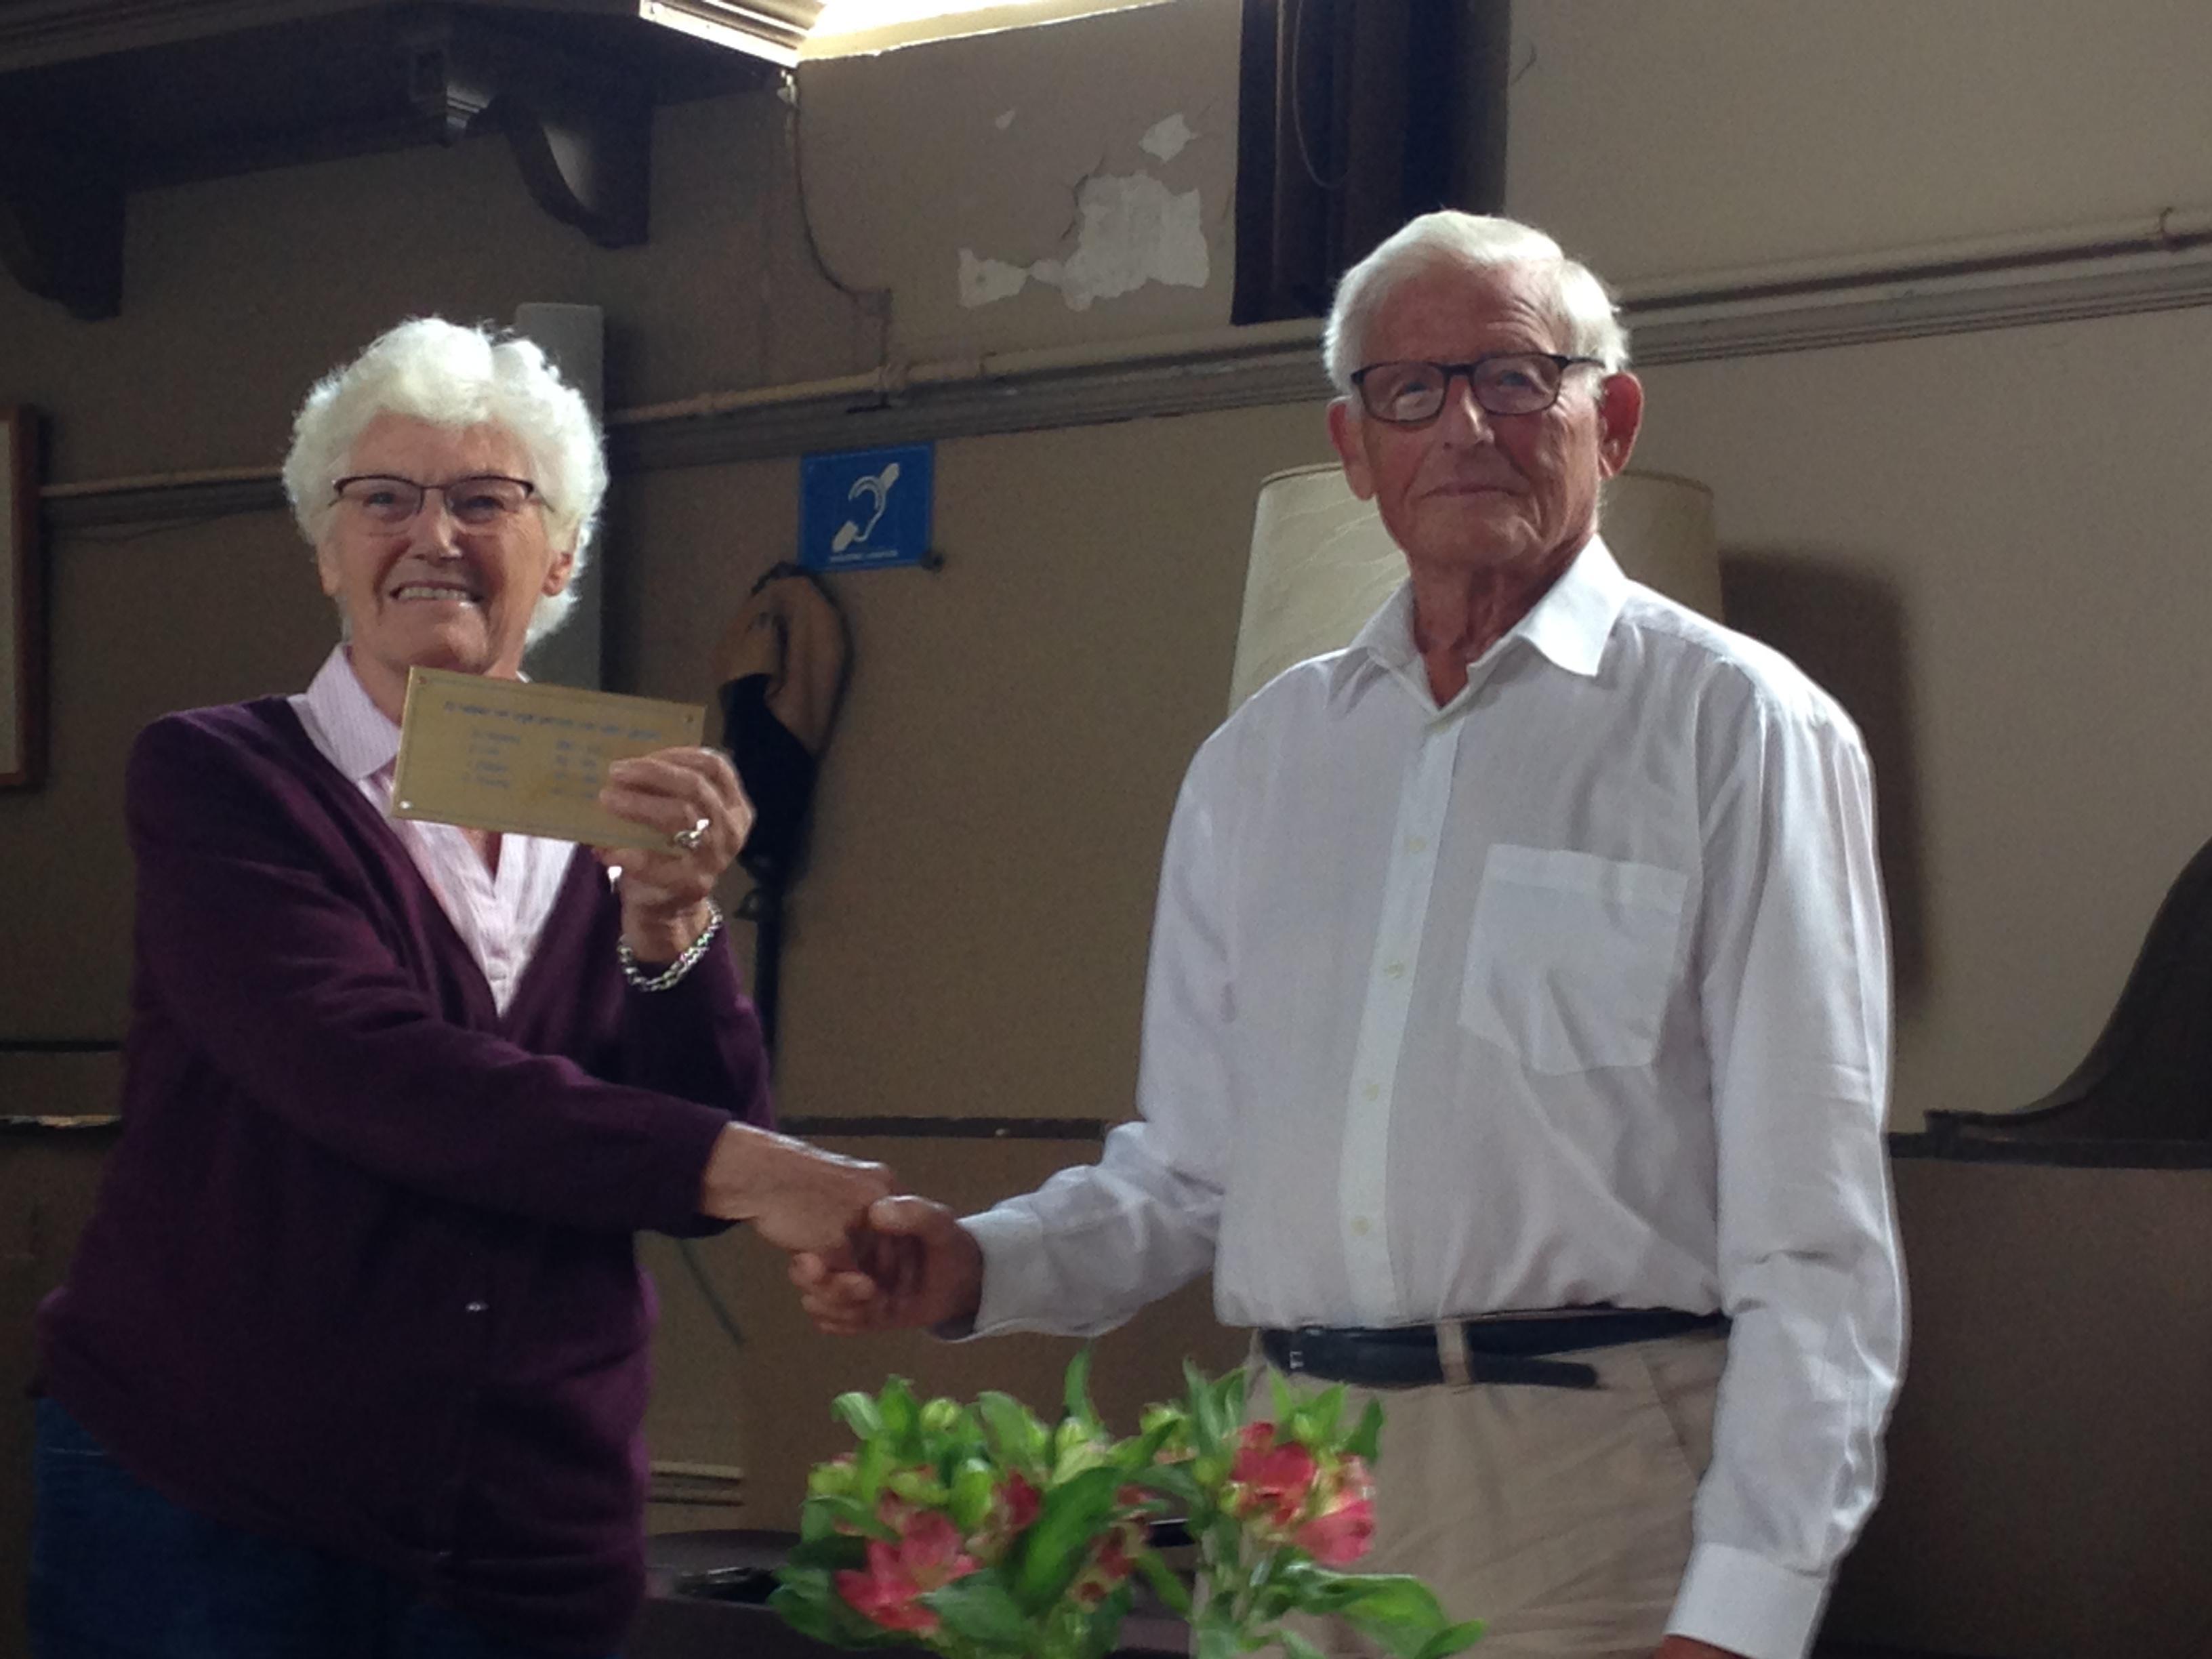 Dhr Finnema 25 jaar lang als orgelpomper